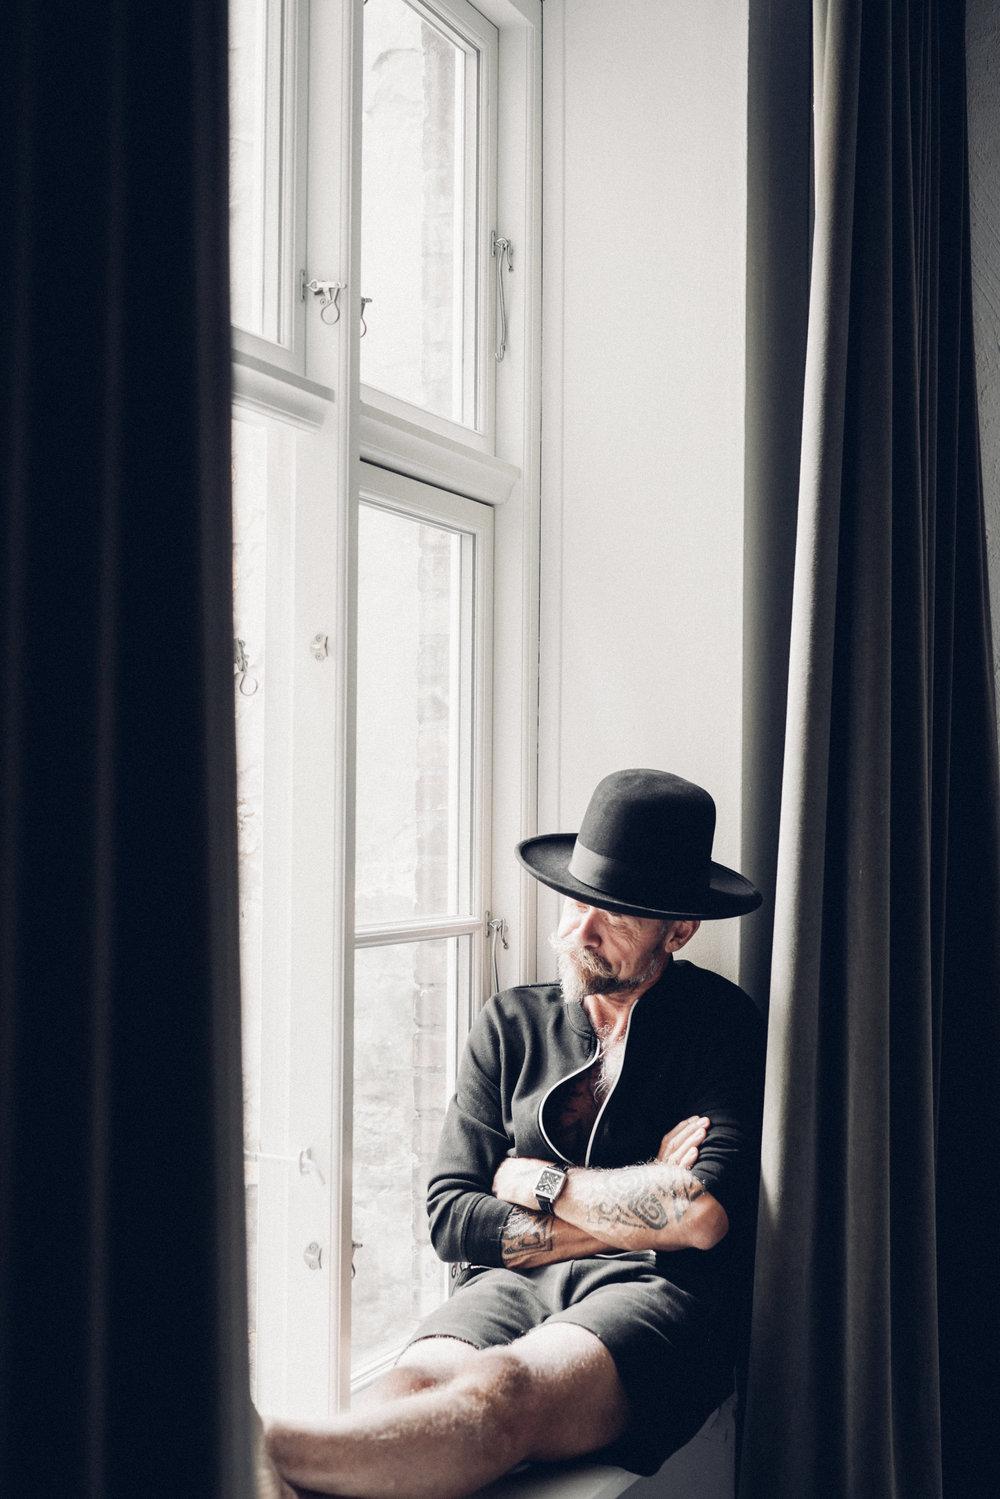 Morten Angelo sitting by the window